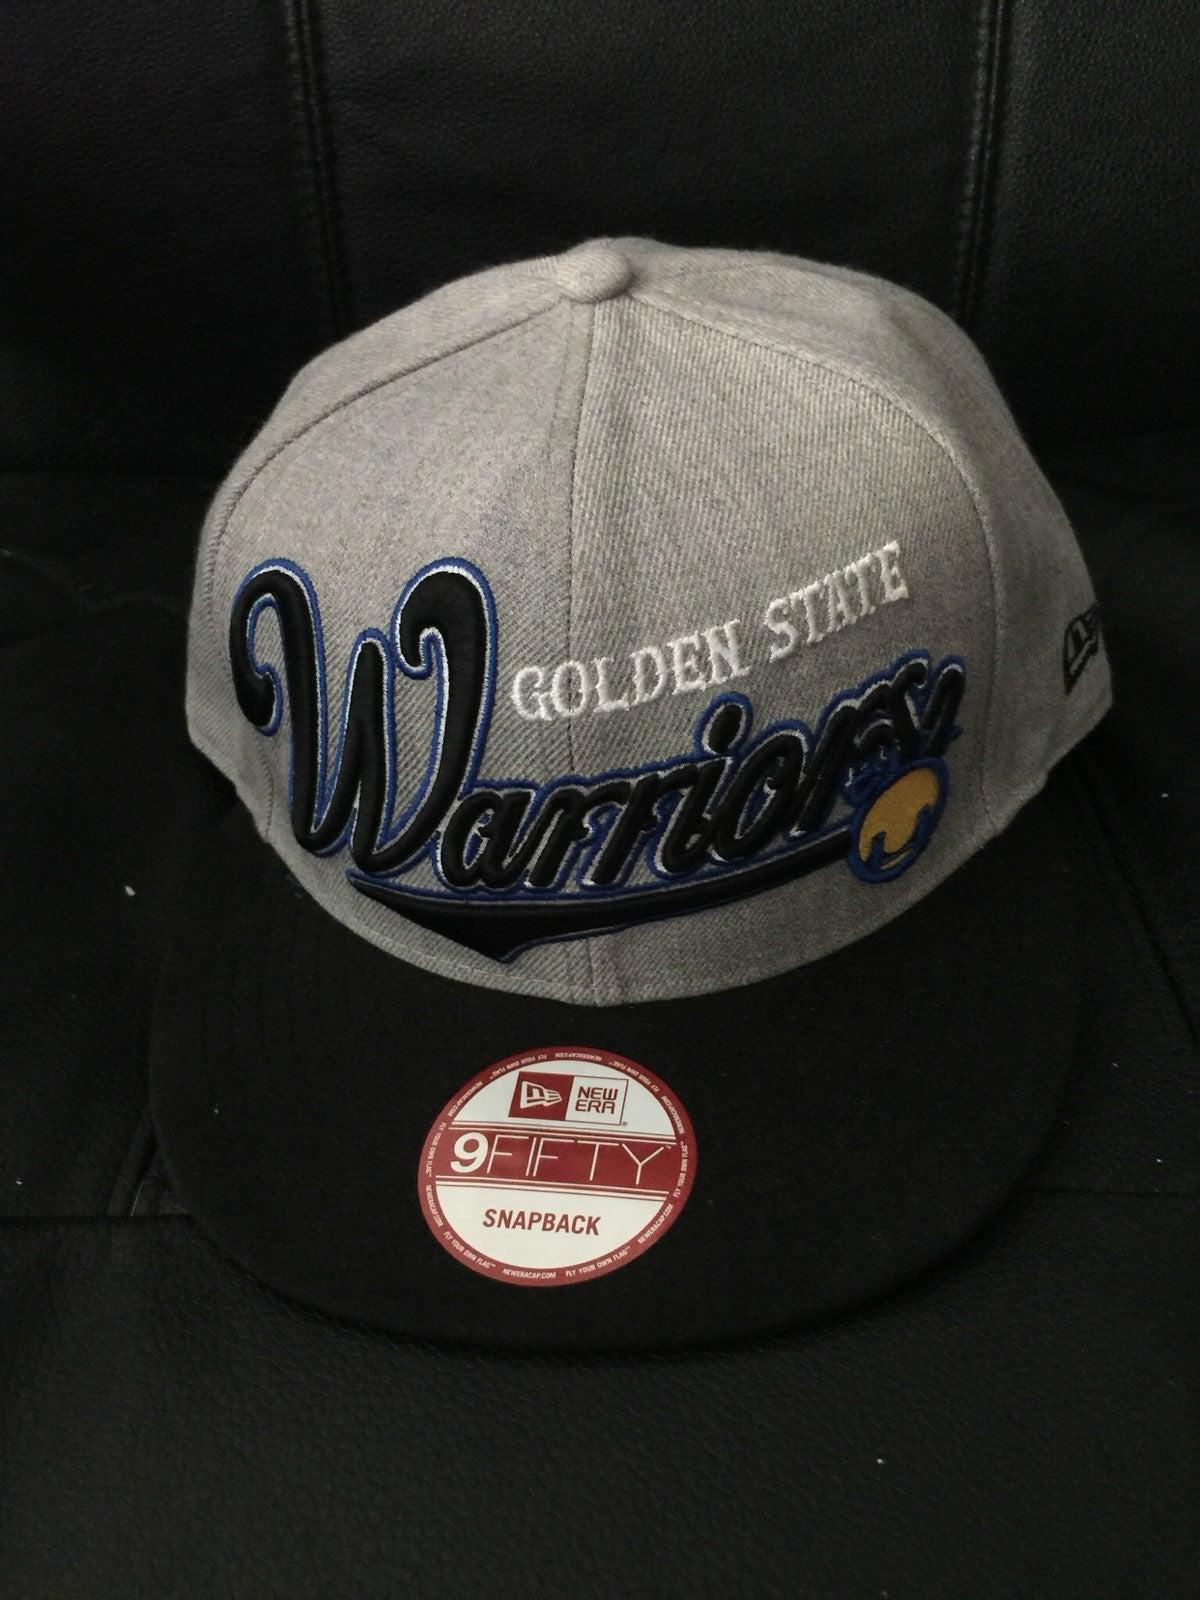 New era Snapback Warriors hat